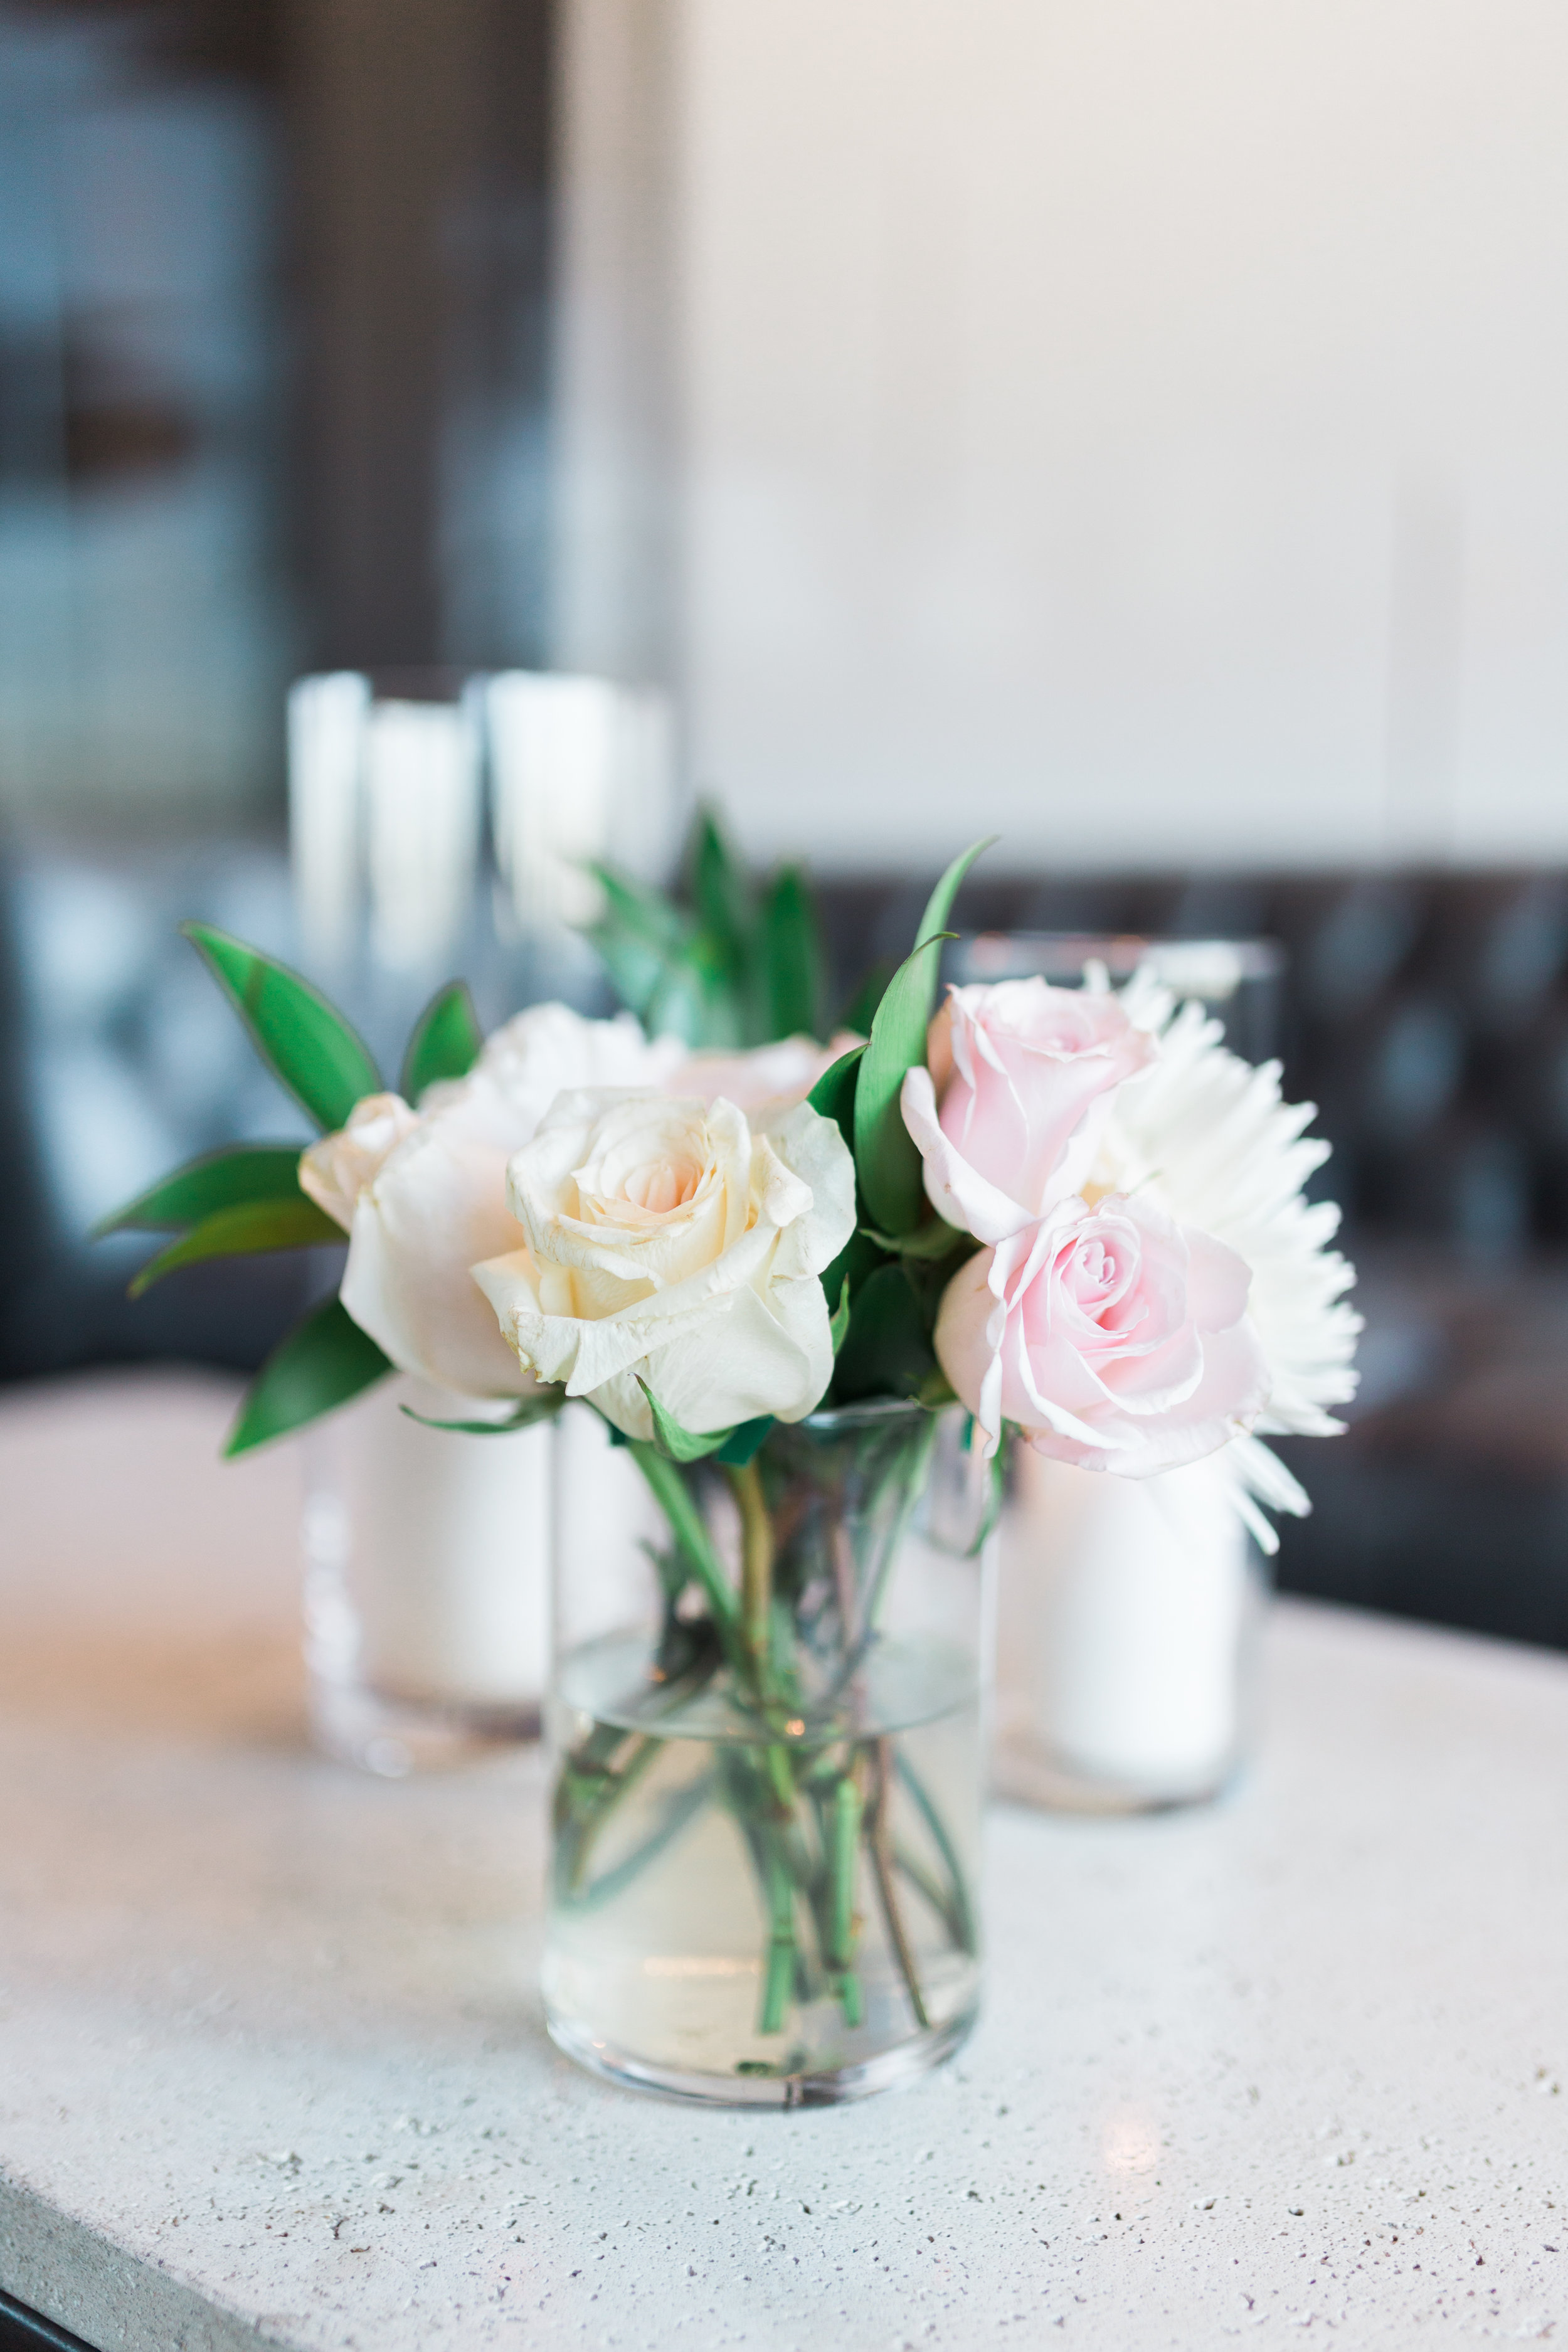 Toronto Fine Art Photographer - 180 Restaurant Wedding - Ceremony-75.jpg